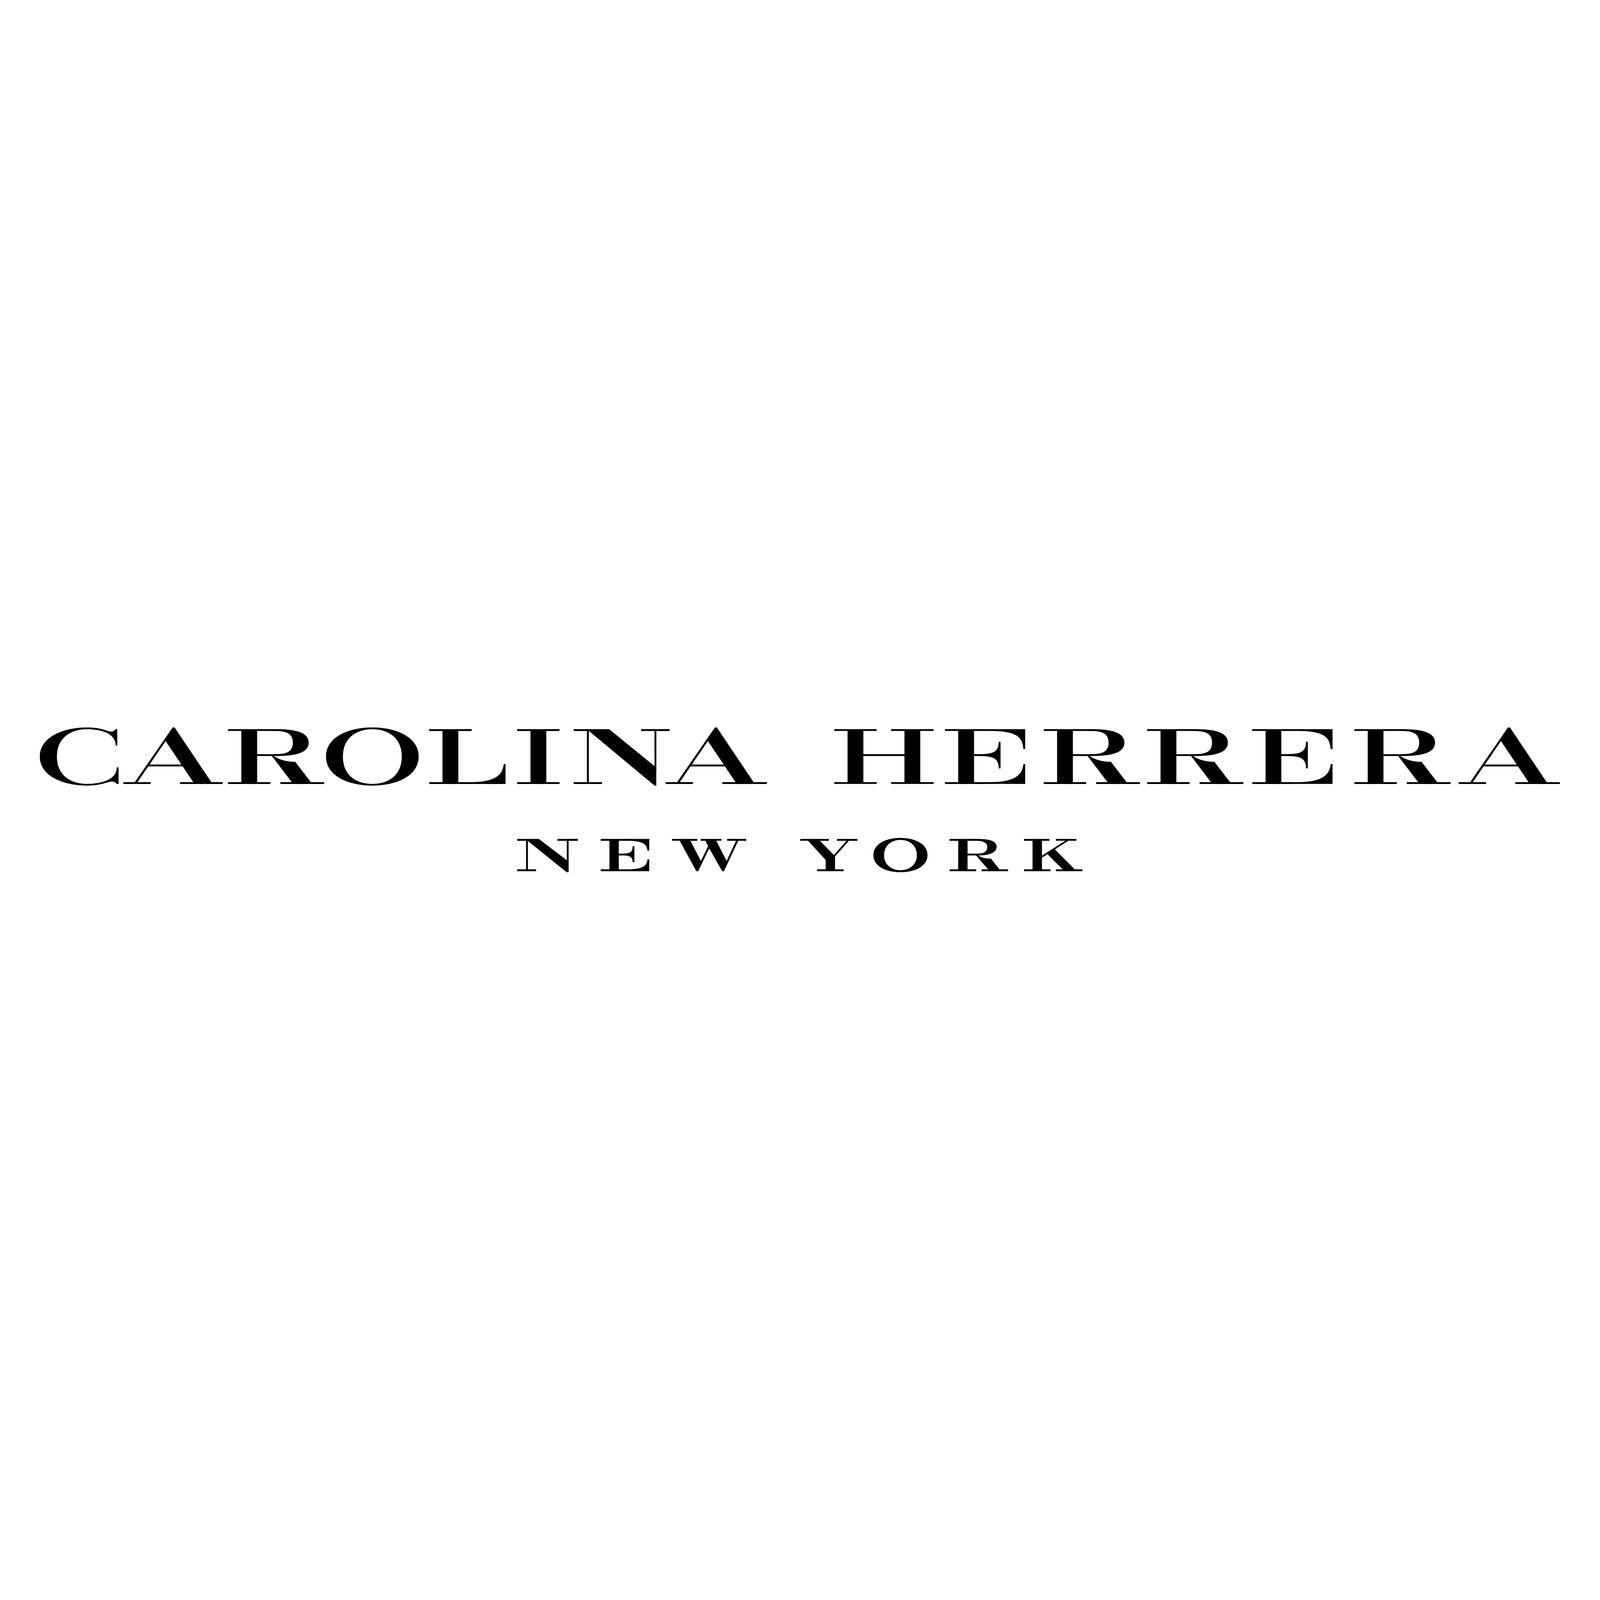 CAROLINA HERRERA (Bild 1)